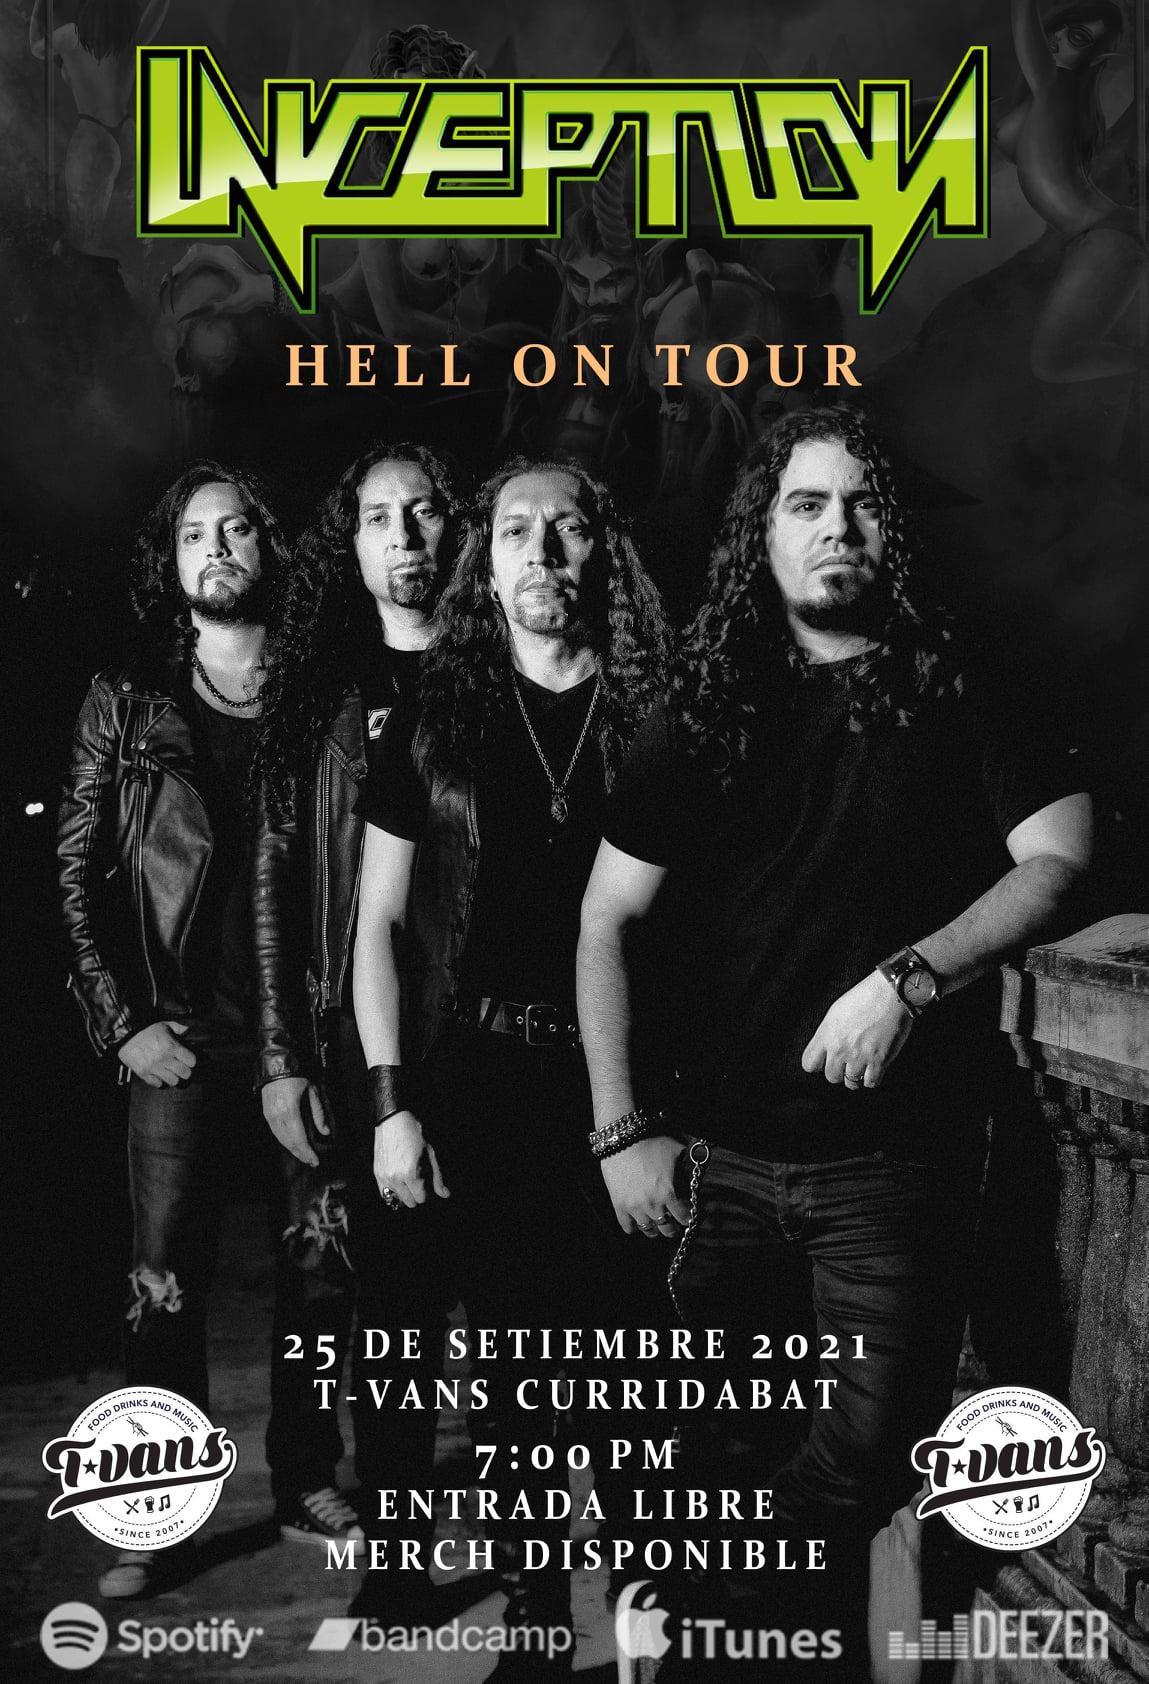 Inception Hell on Tour - Bar Tvans